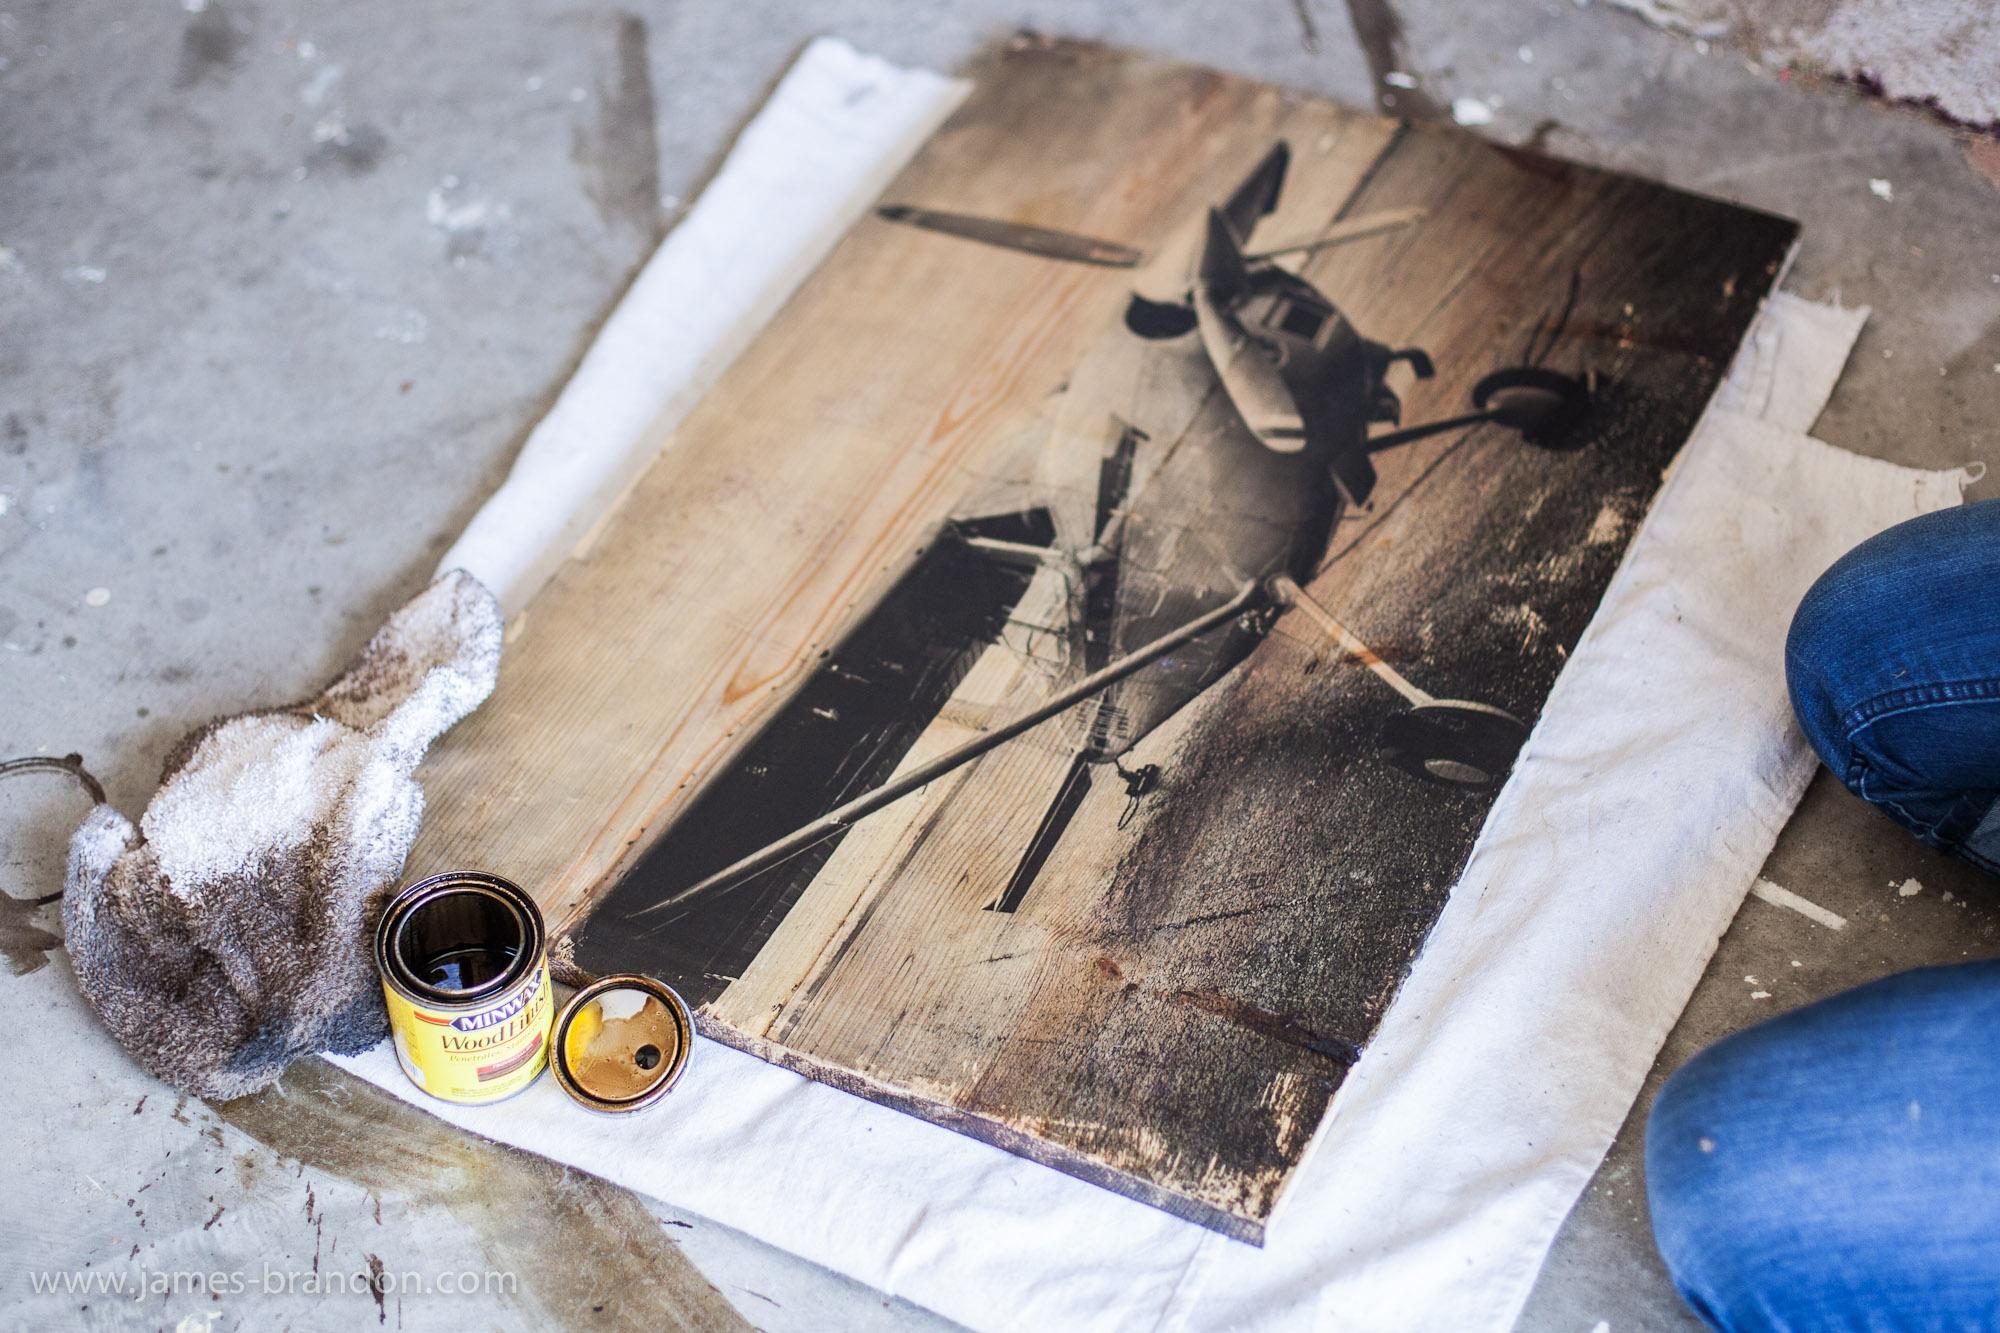 Как перенести фото метал в домашних условиях